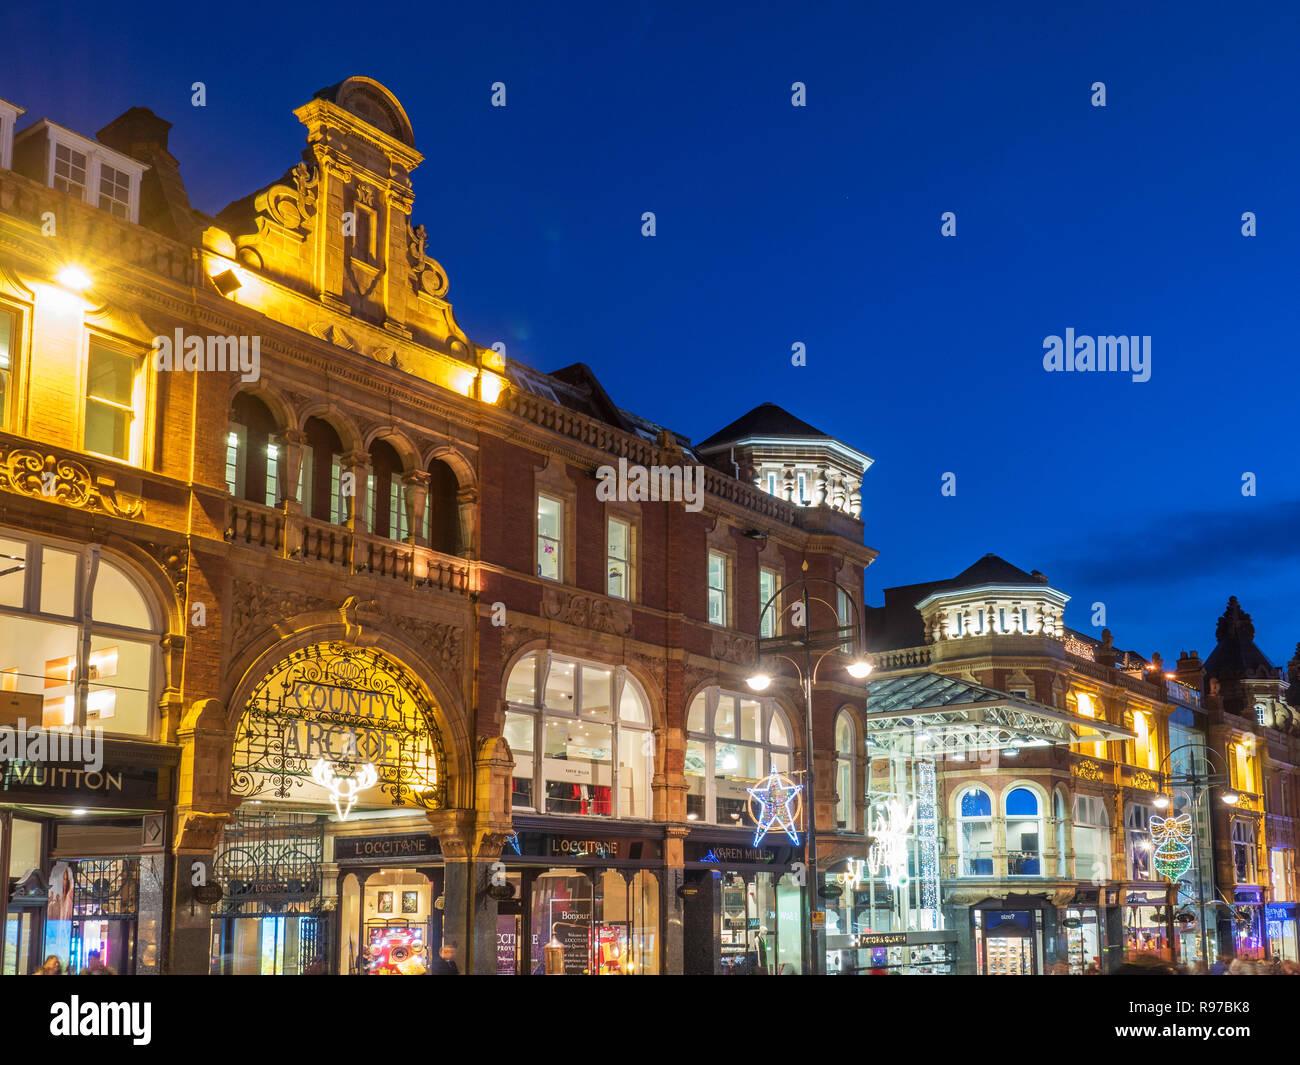 Leeds West Yorkshire England - Stock Image